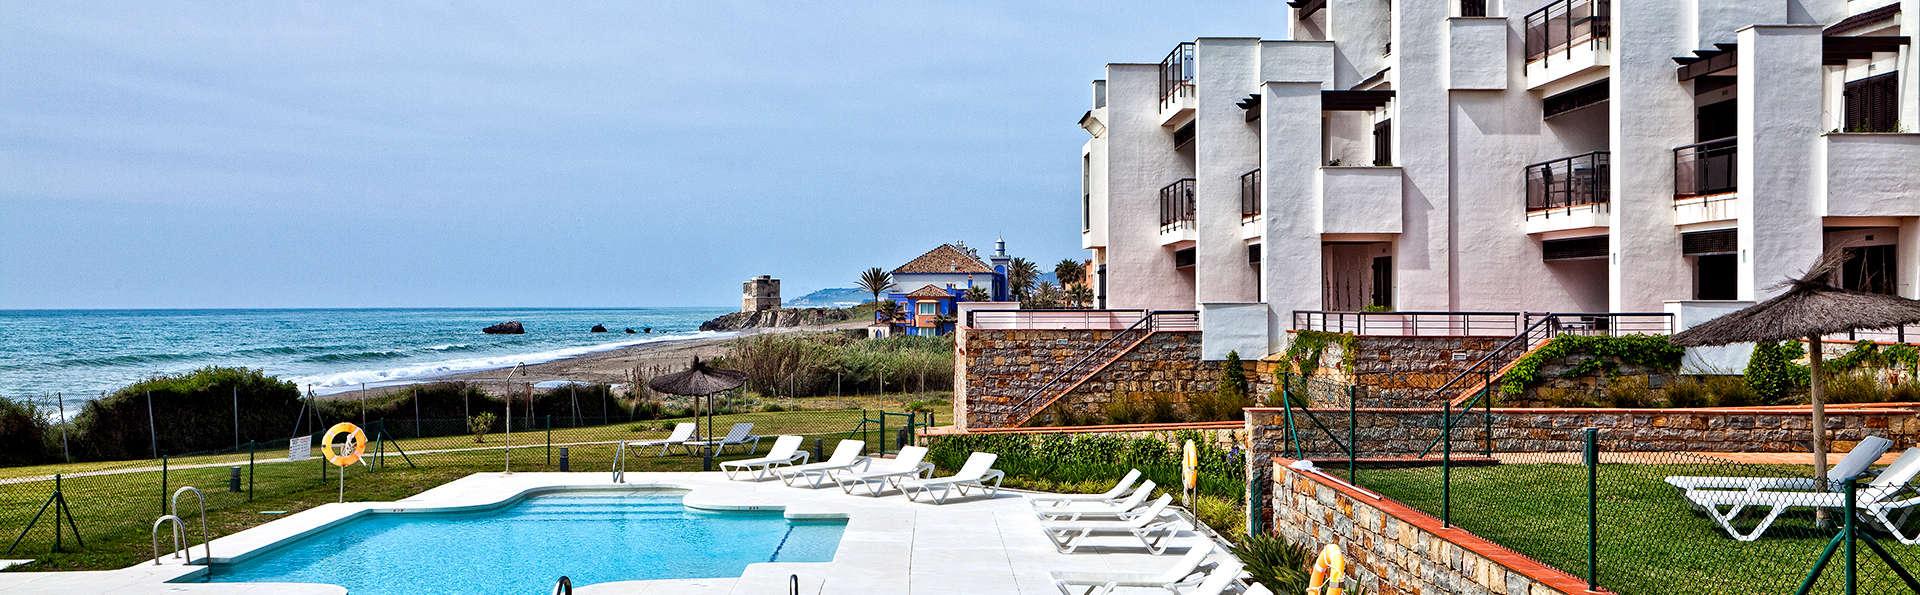 Casares del Mar Luxury Apartments - Edit_Pool2.jpg